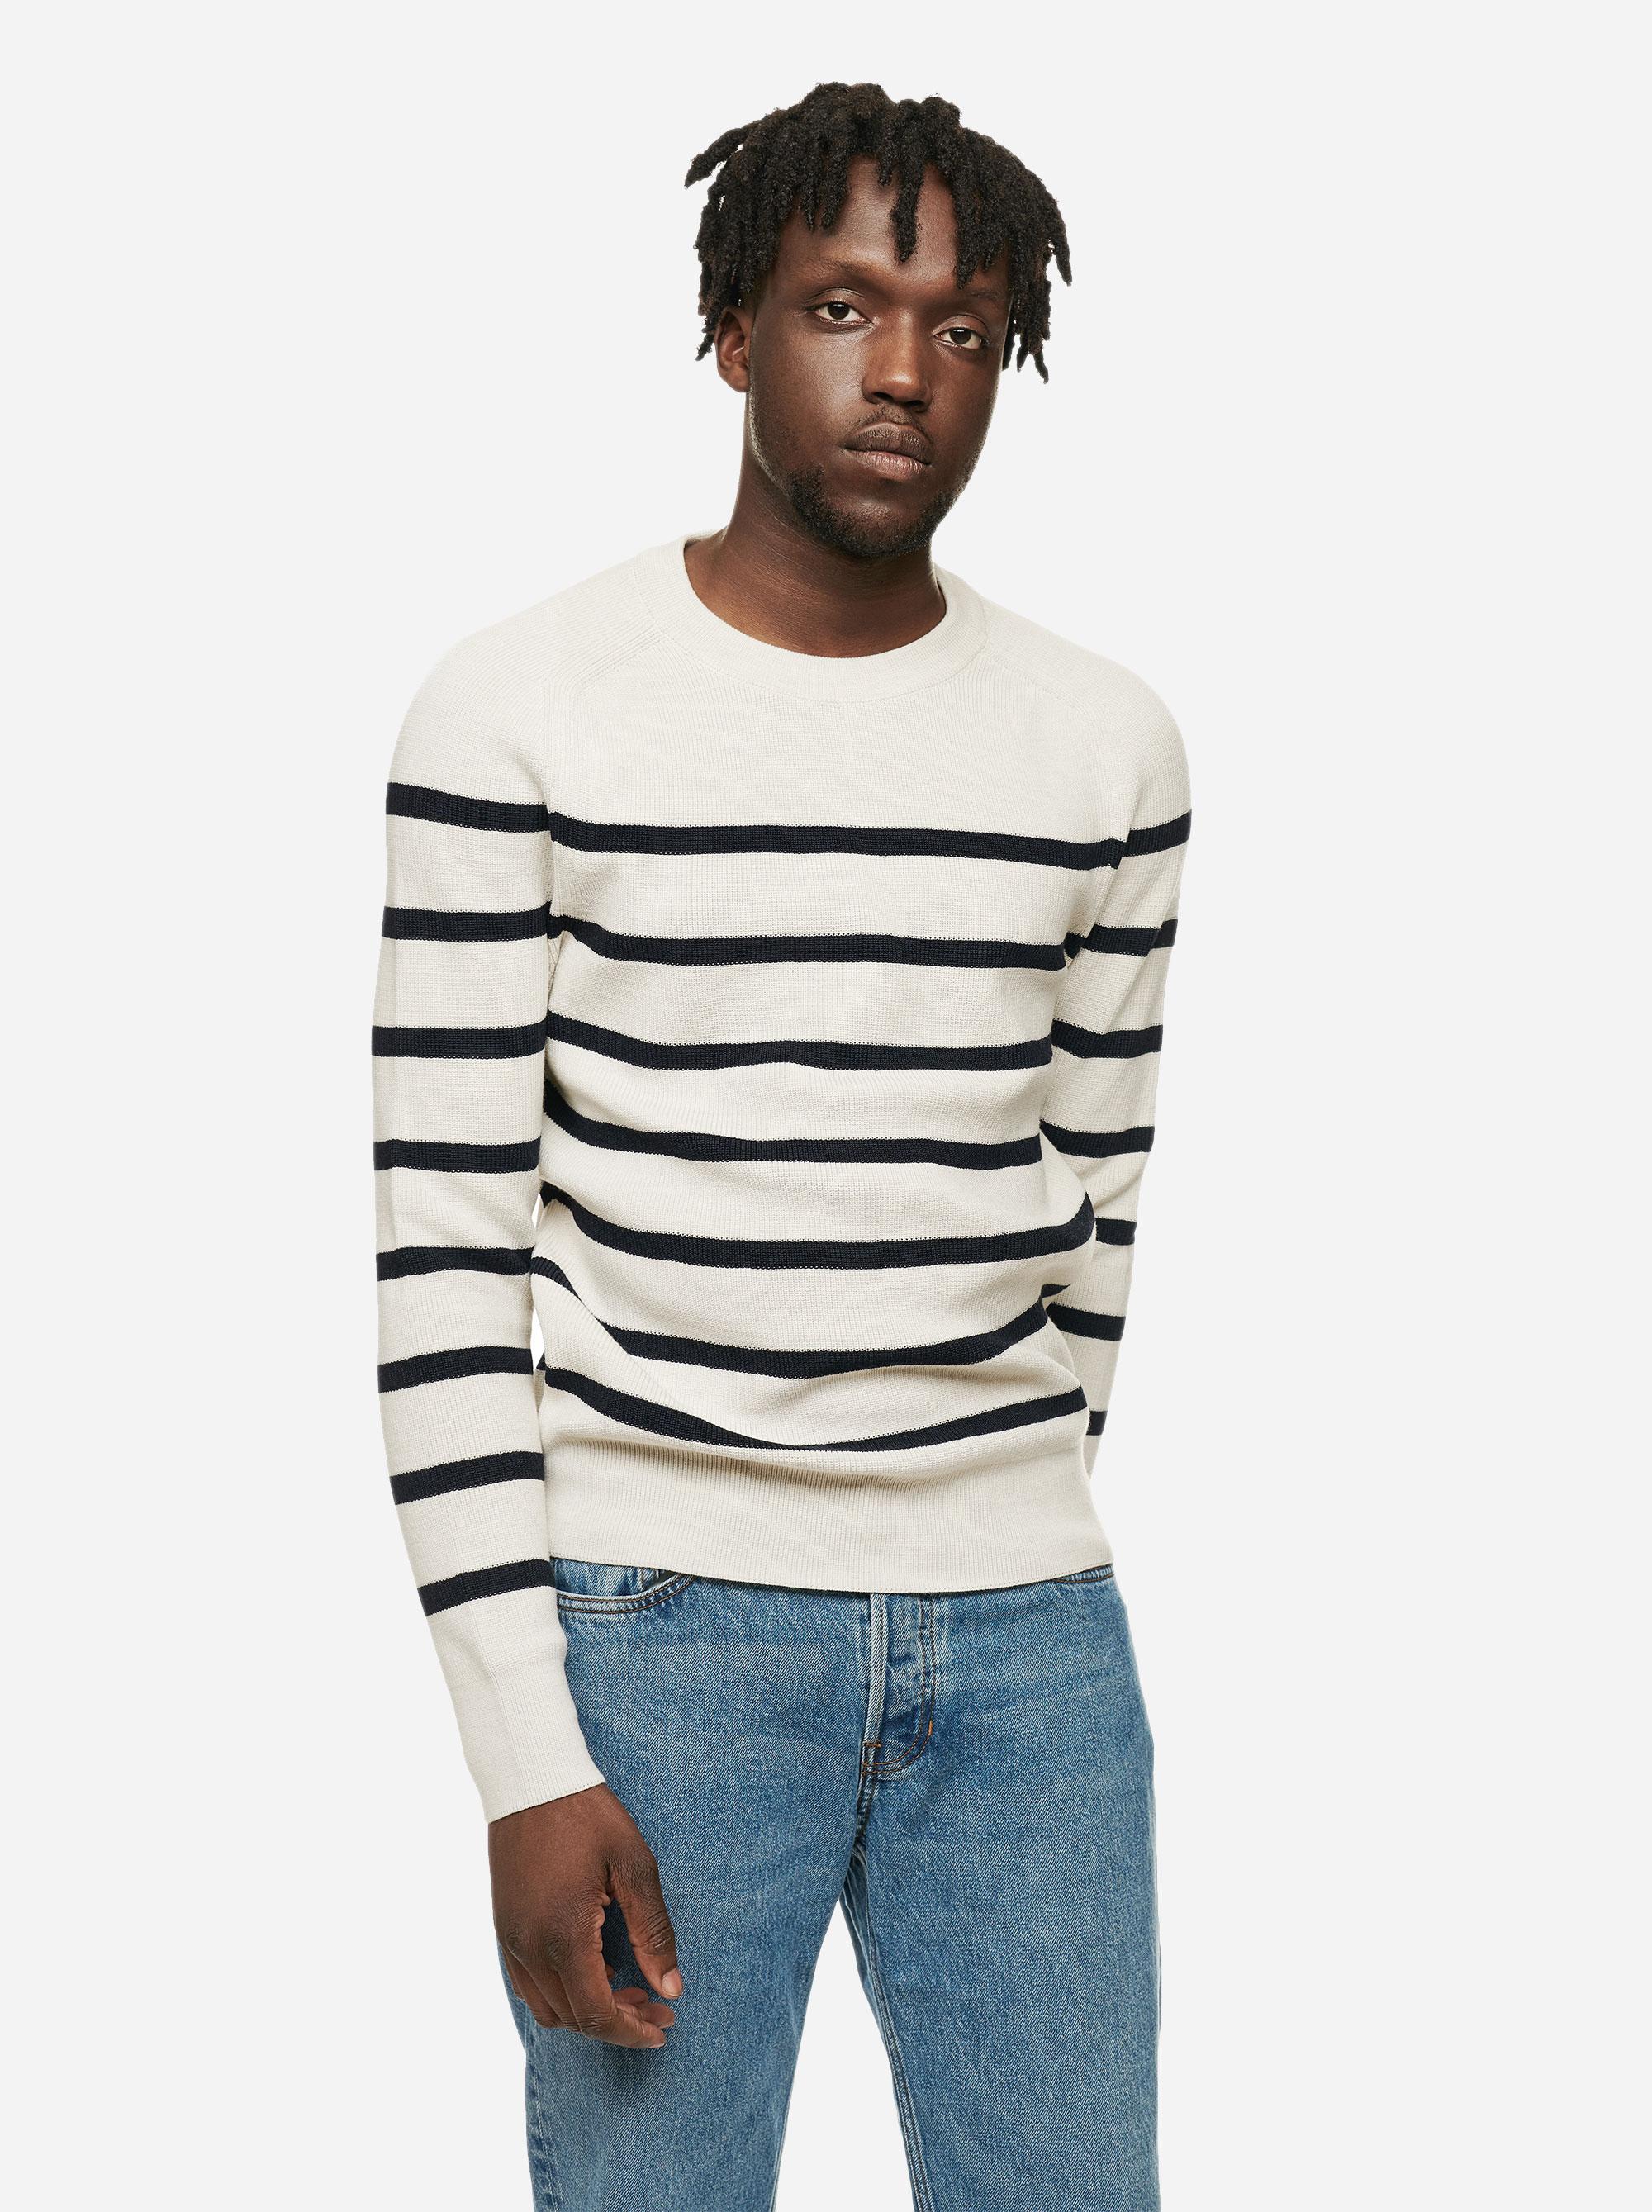 Teym - The Merino Sweater - Men - Striped - 2